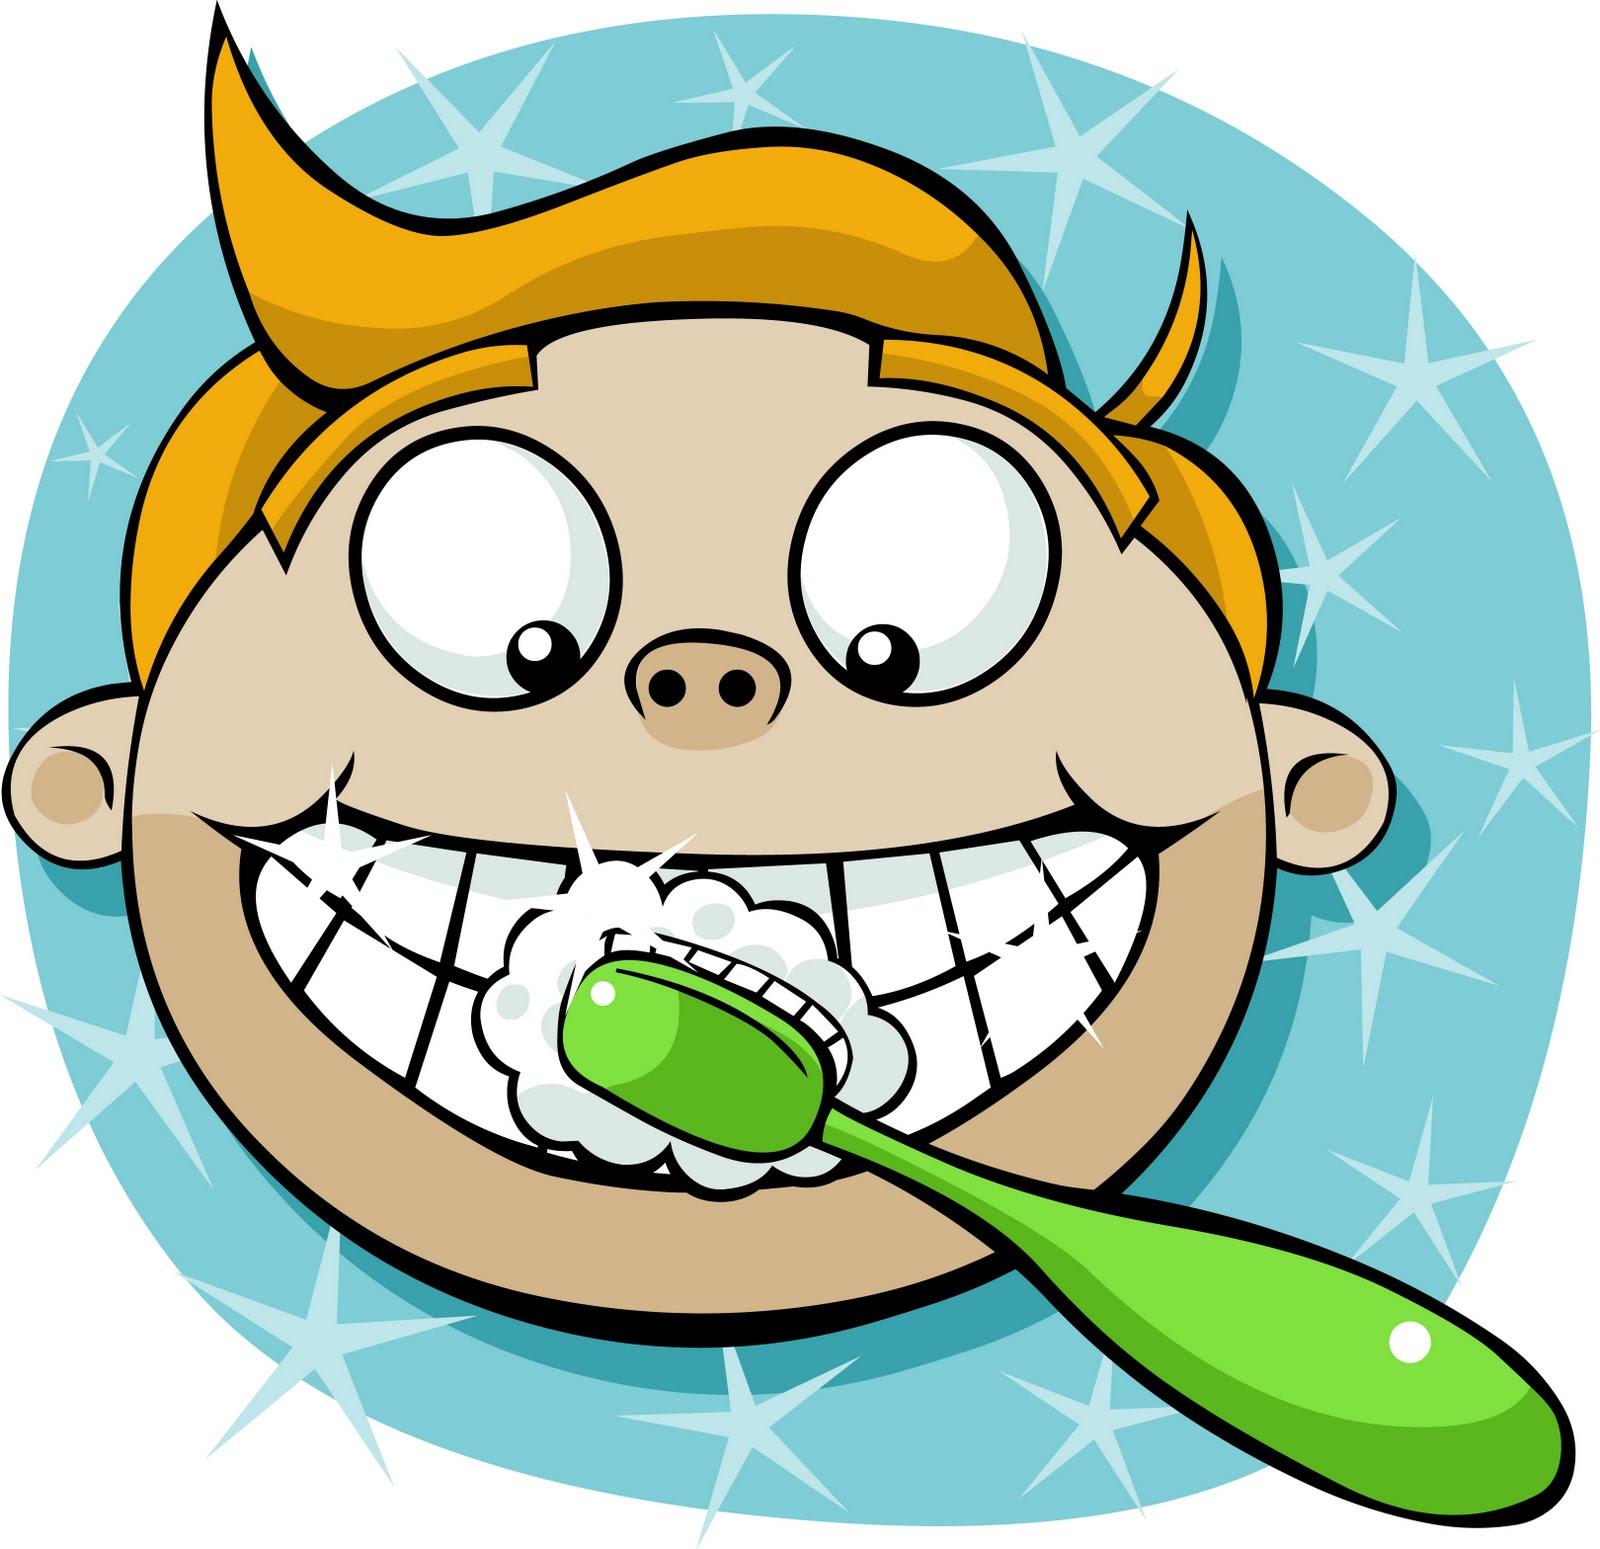 1600x1549 Brush Teeth Animated Clip Art Tooth Danasrgh Top Image